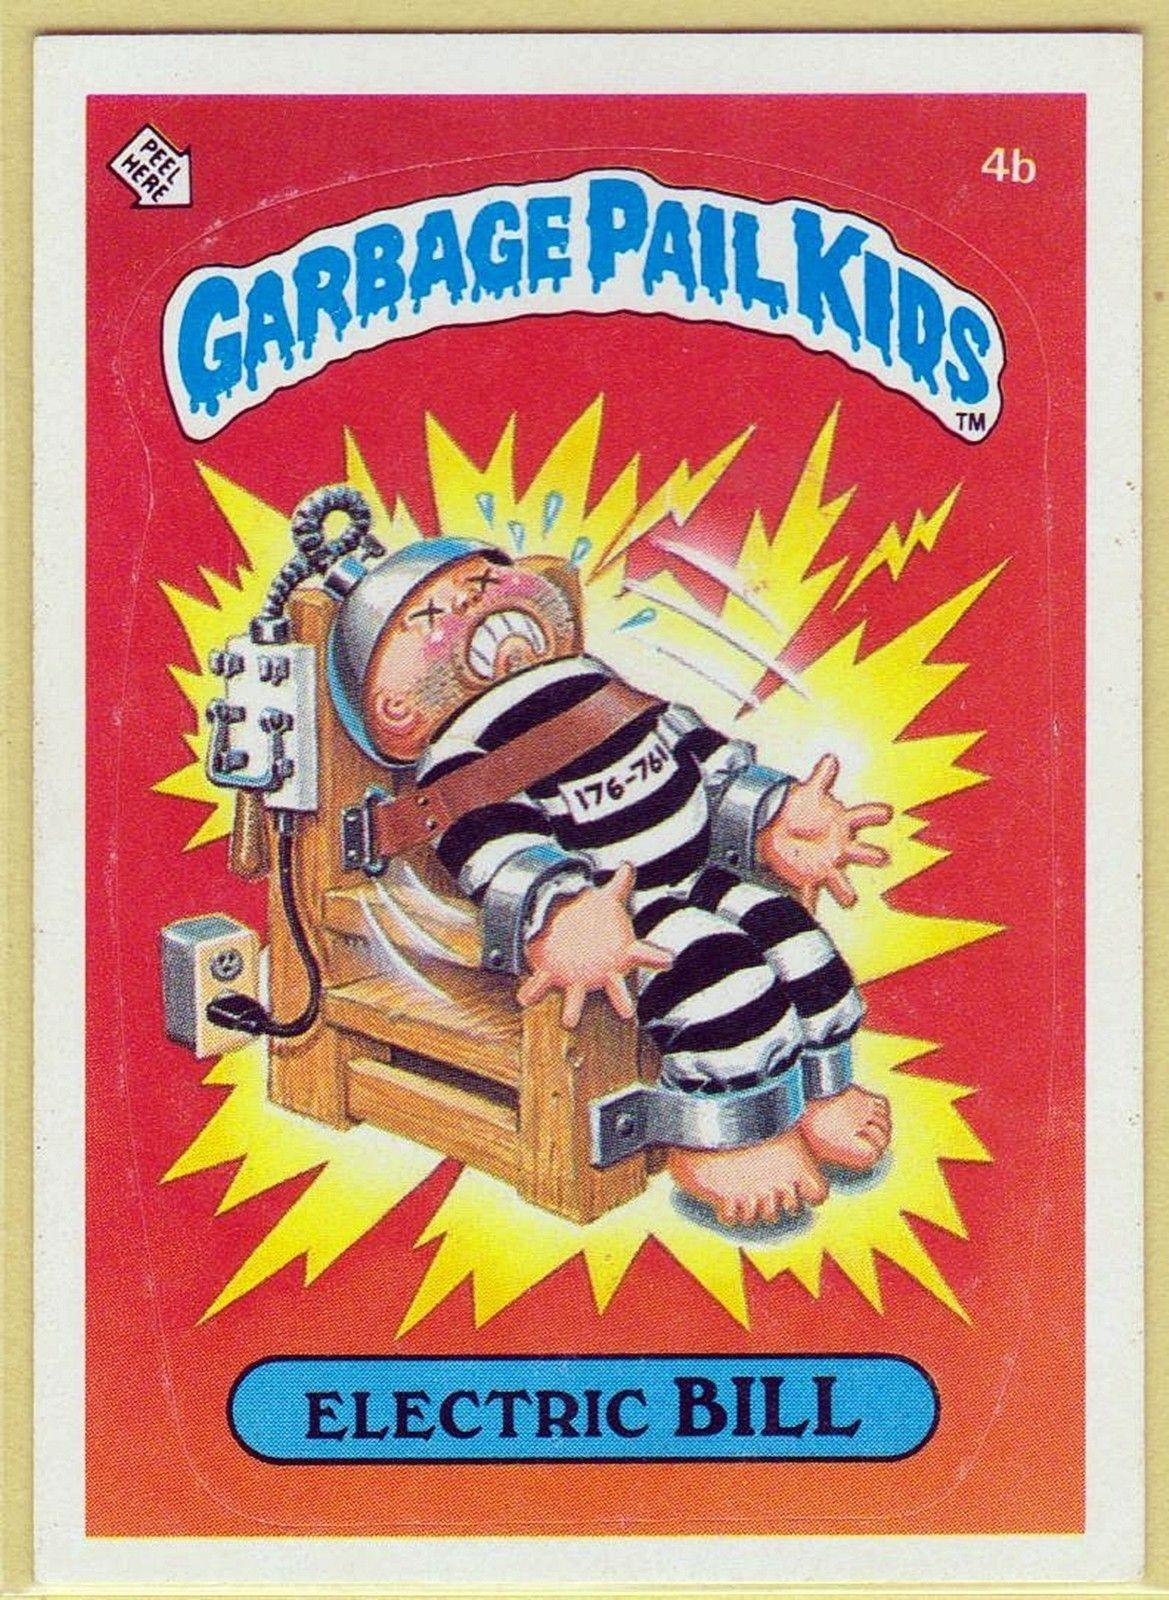 Garbage Pail Kids Comics And Cards Pinterest